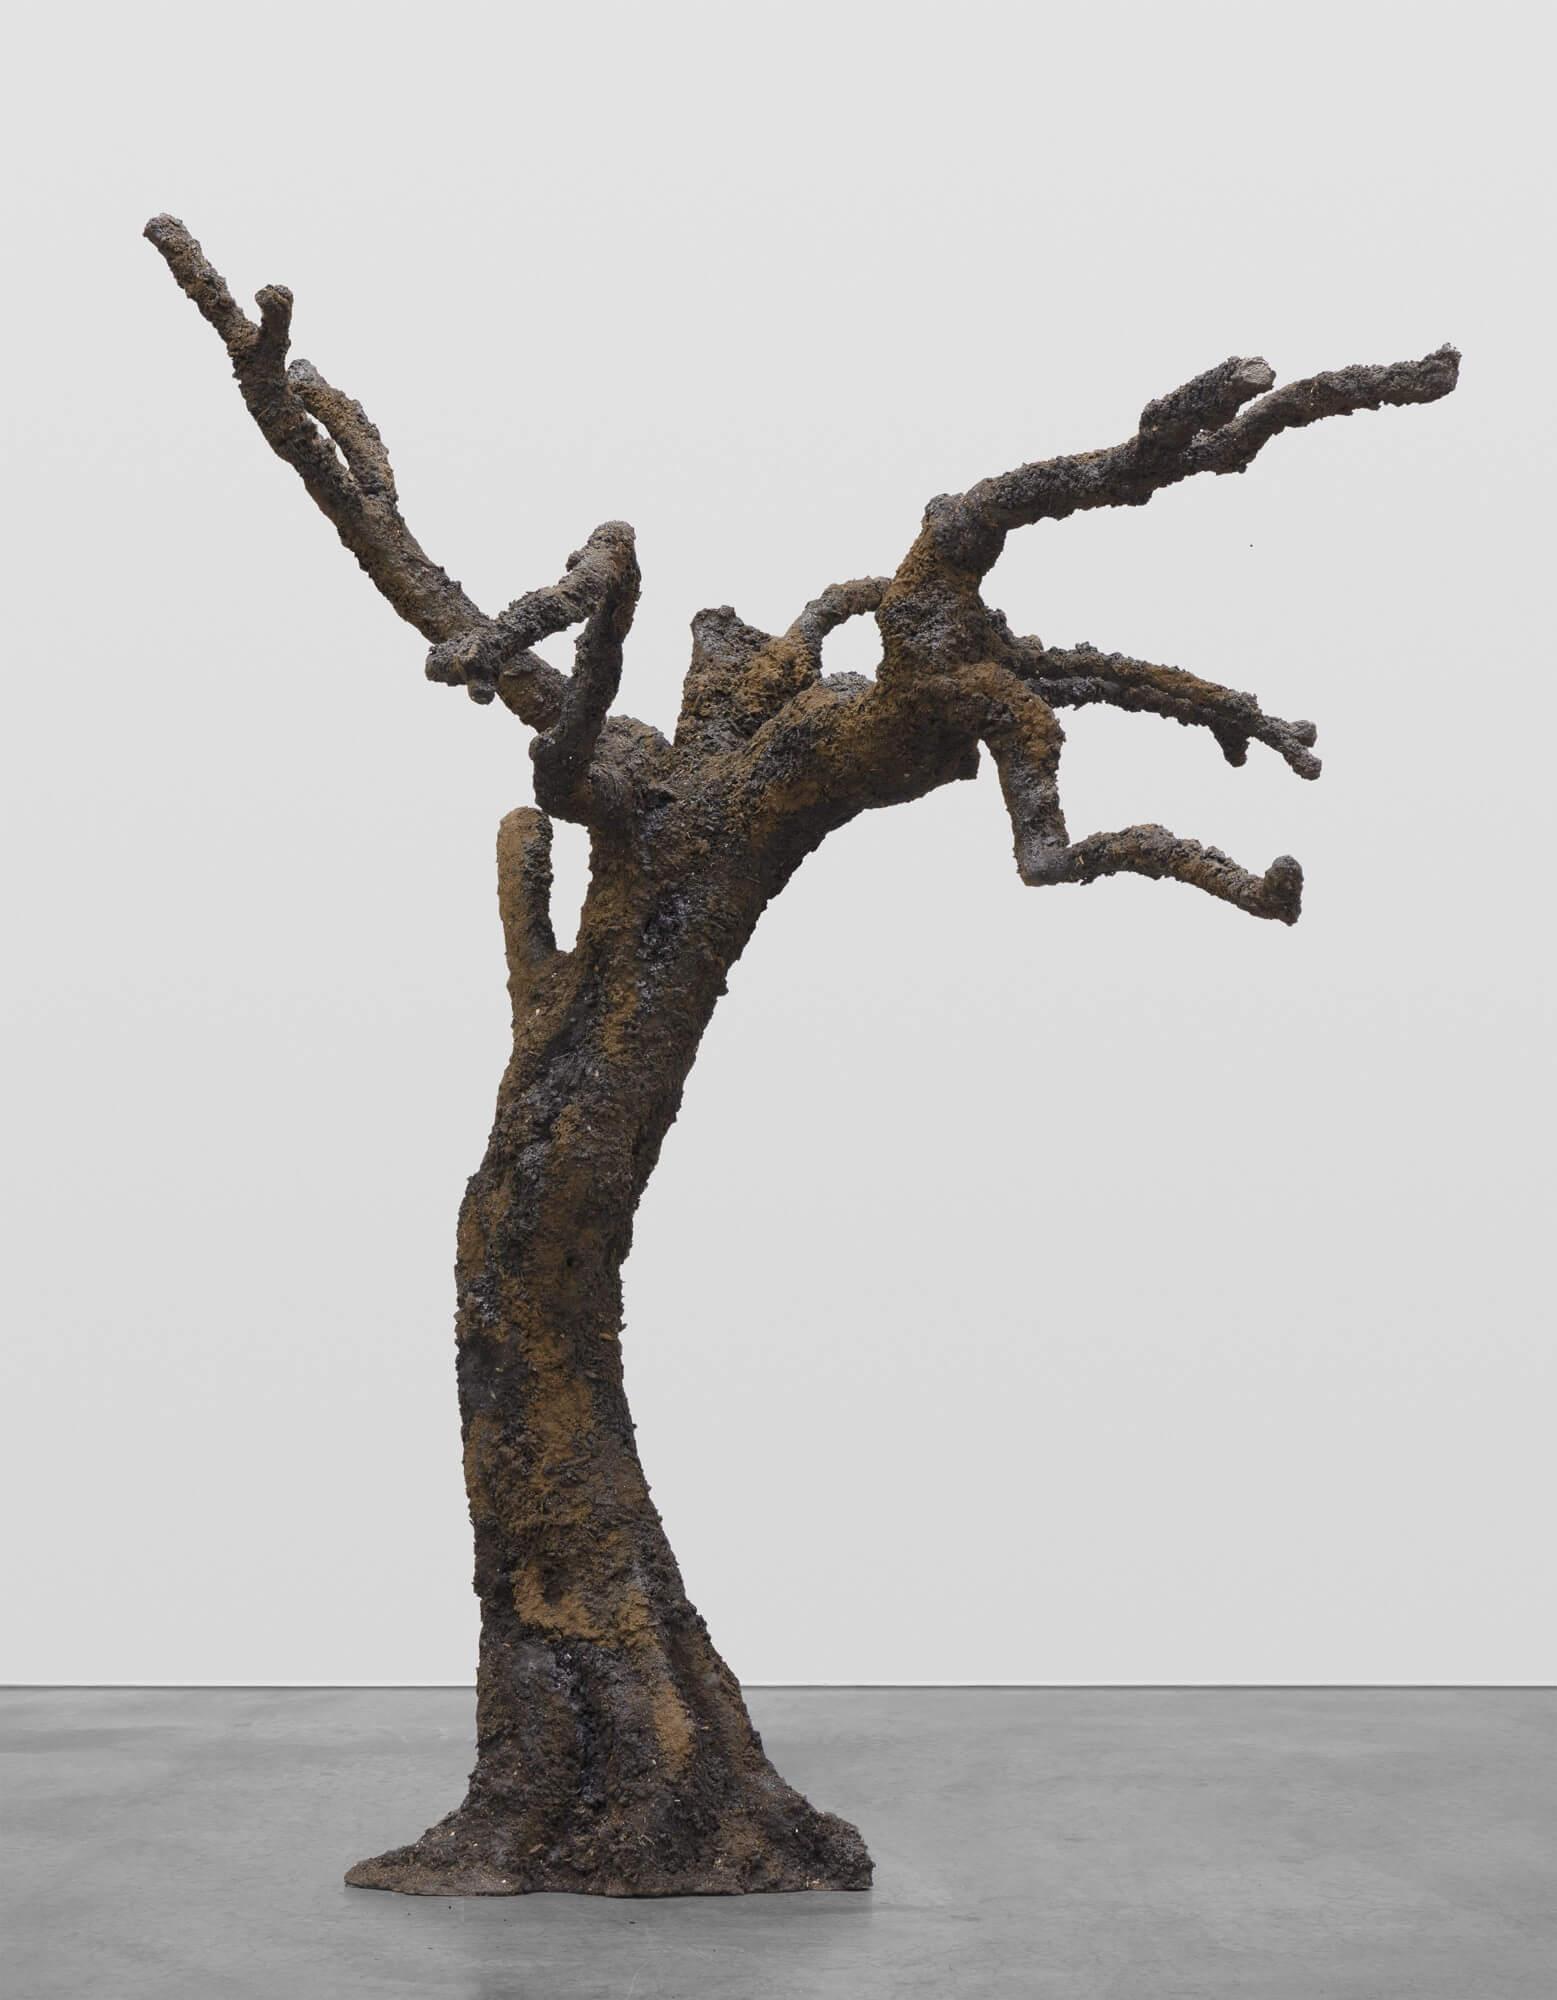 the wisteria | UGO RONDINONE